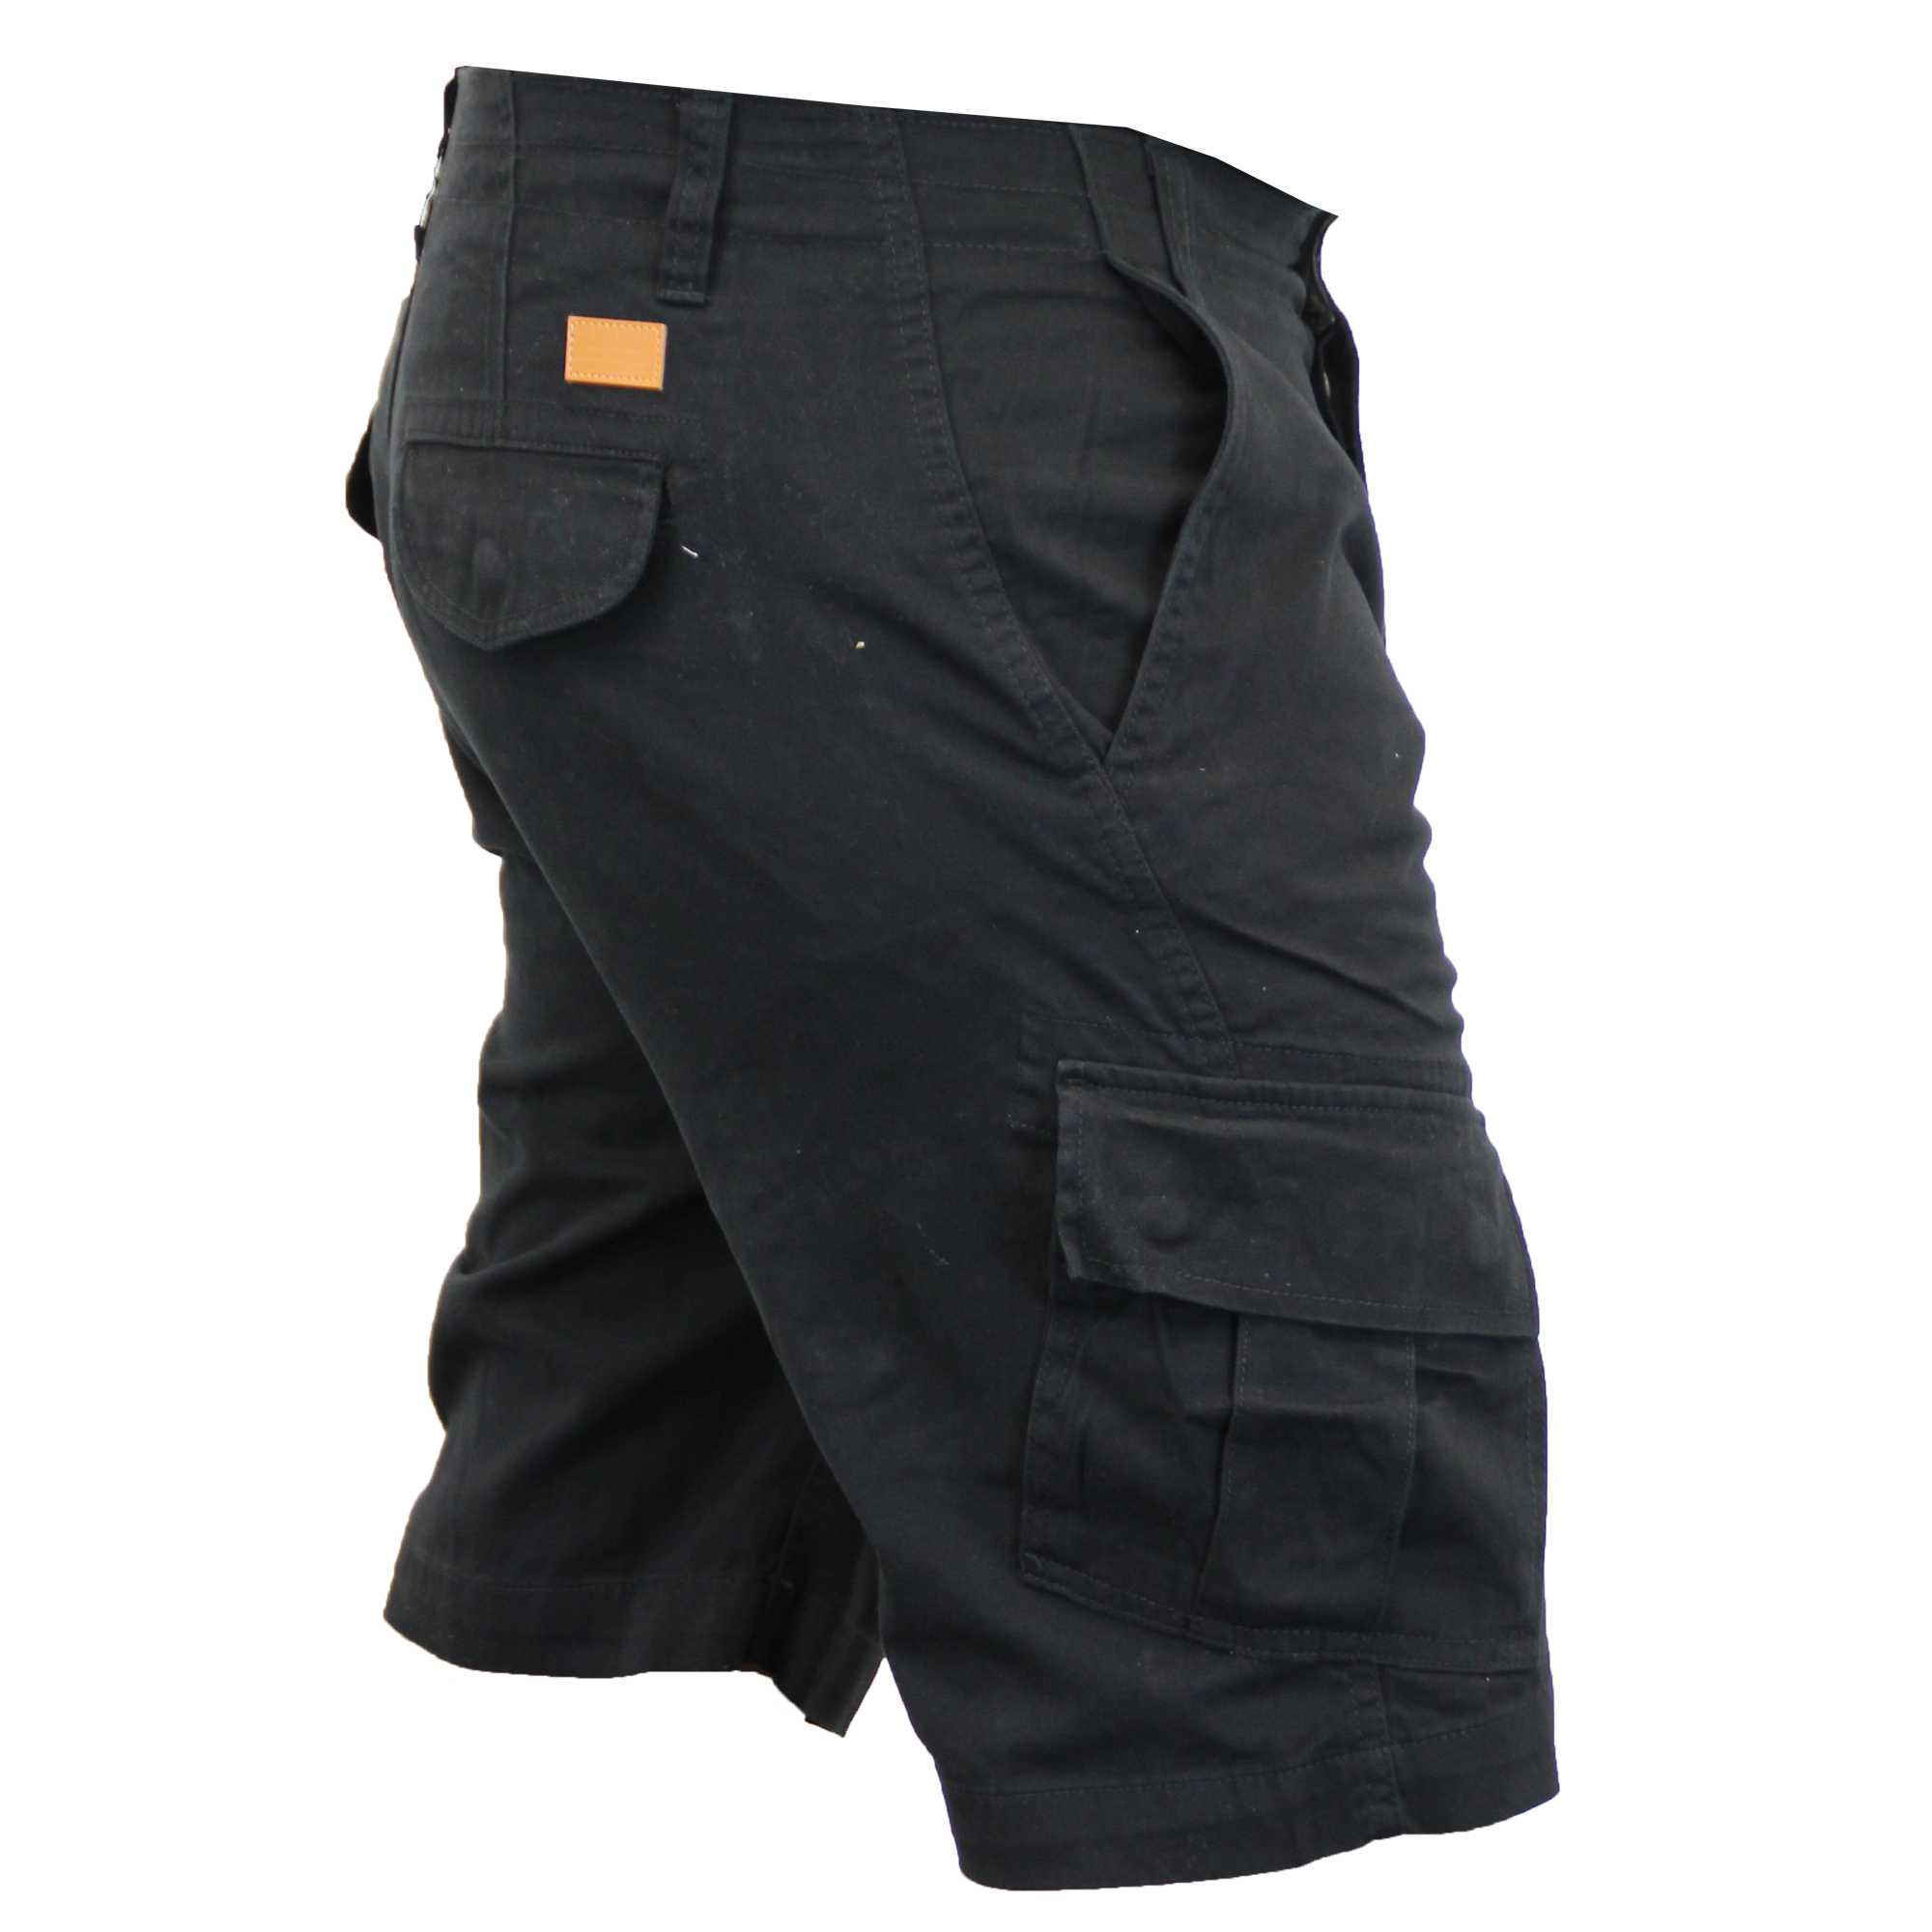 dffefadc98 Mens Cargo Chino Shorts Threadbare Combat Knee Length Westace ...